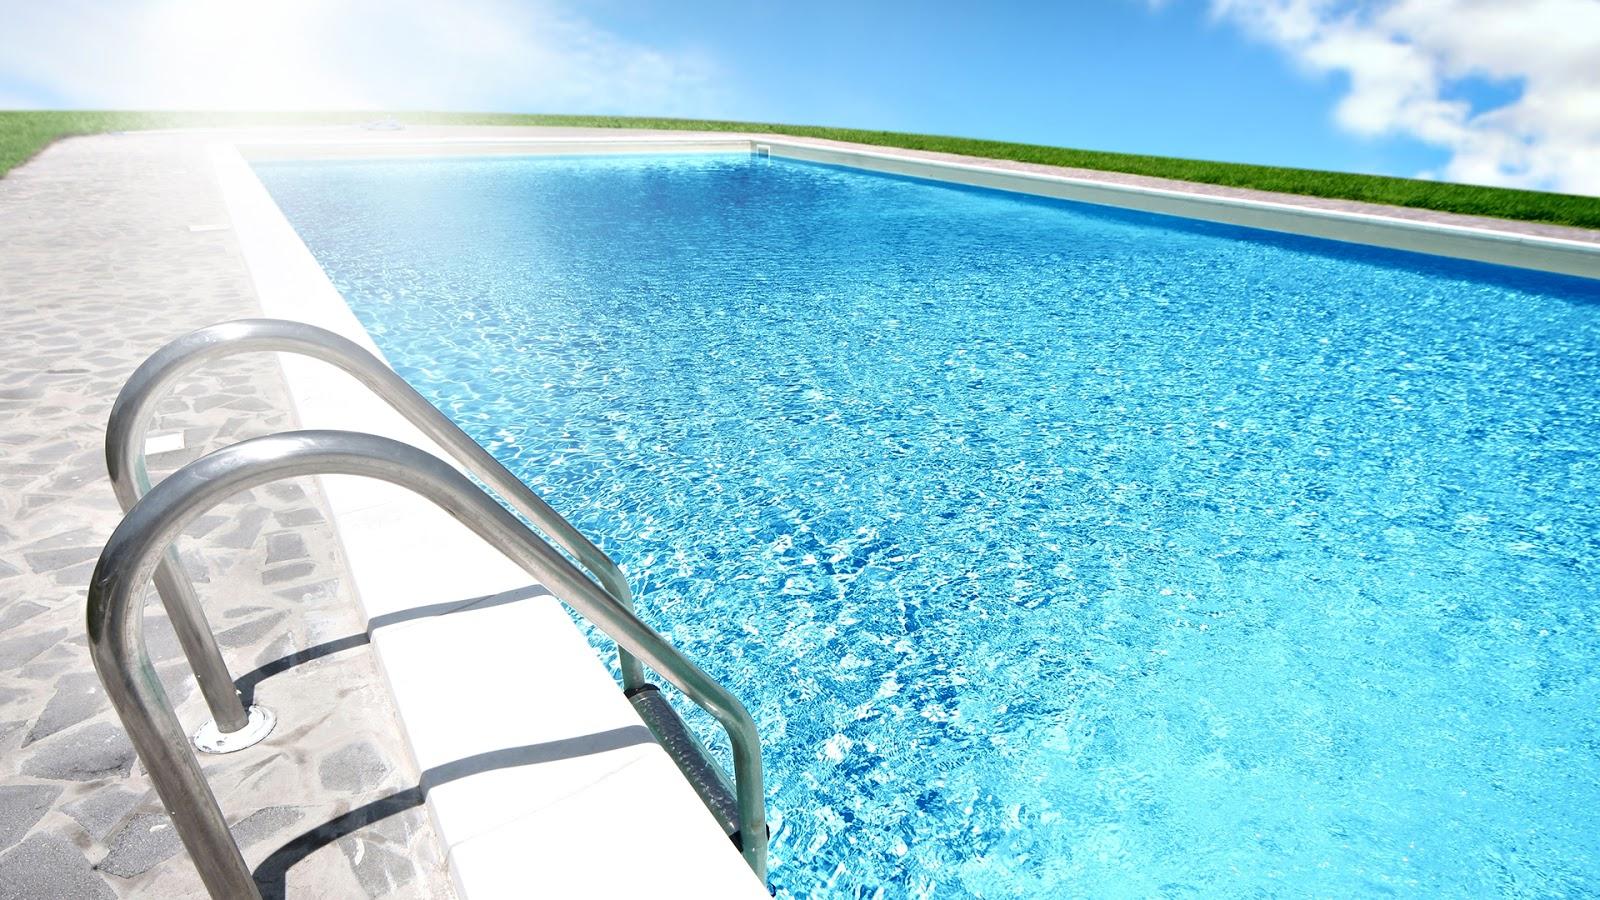 Reinaugurarán piscina en el santacruceño poblado de Haití